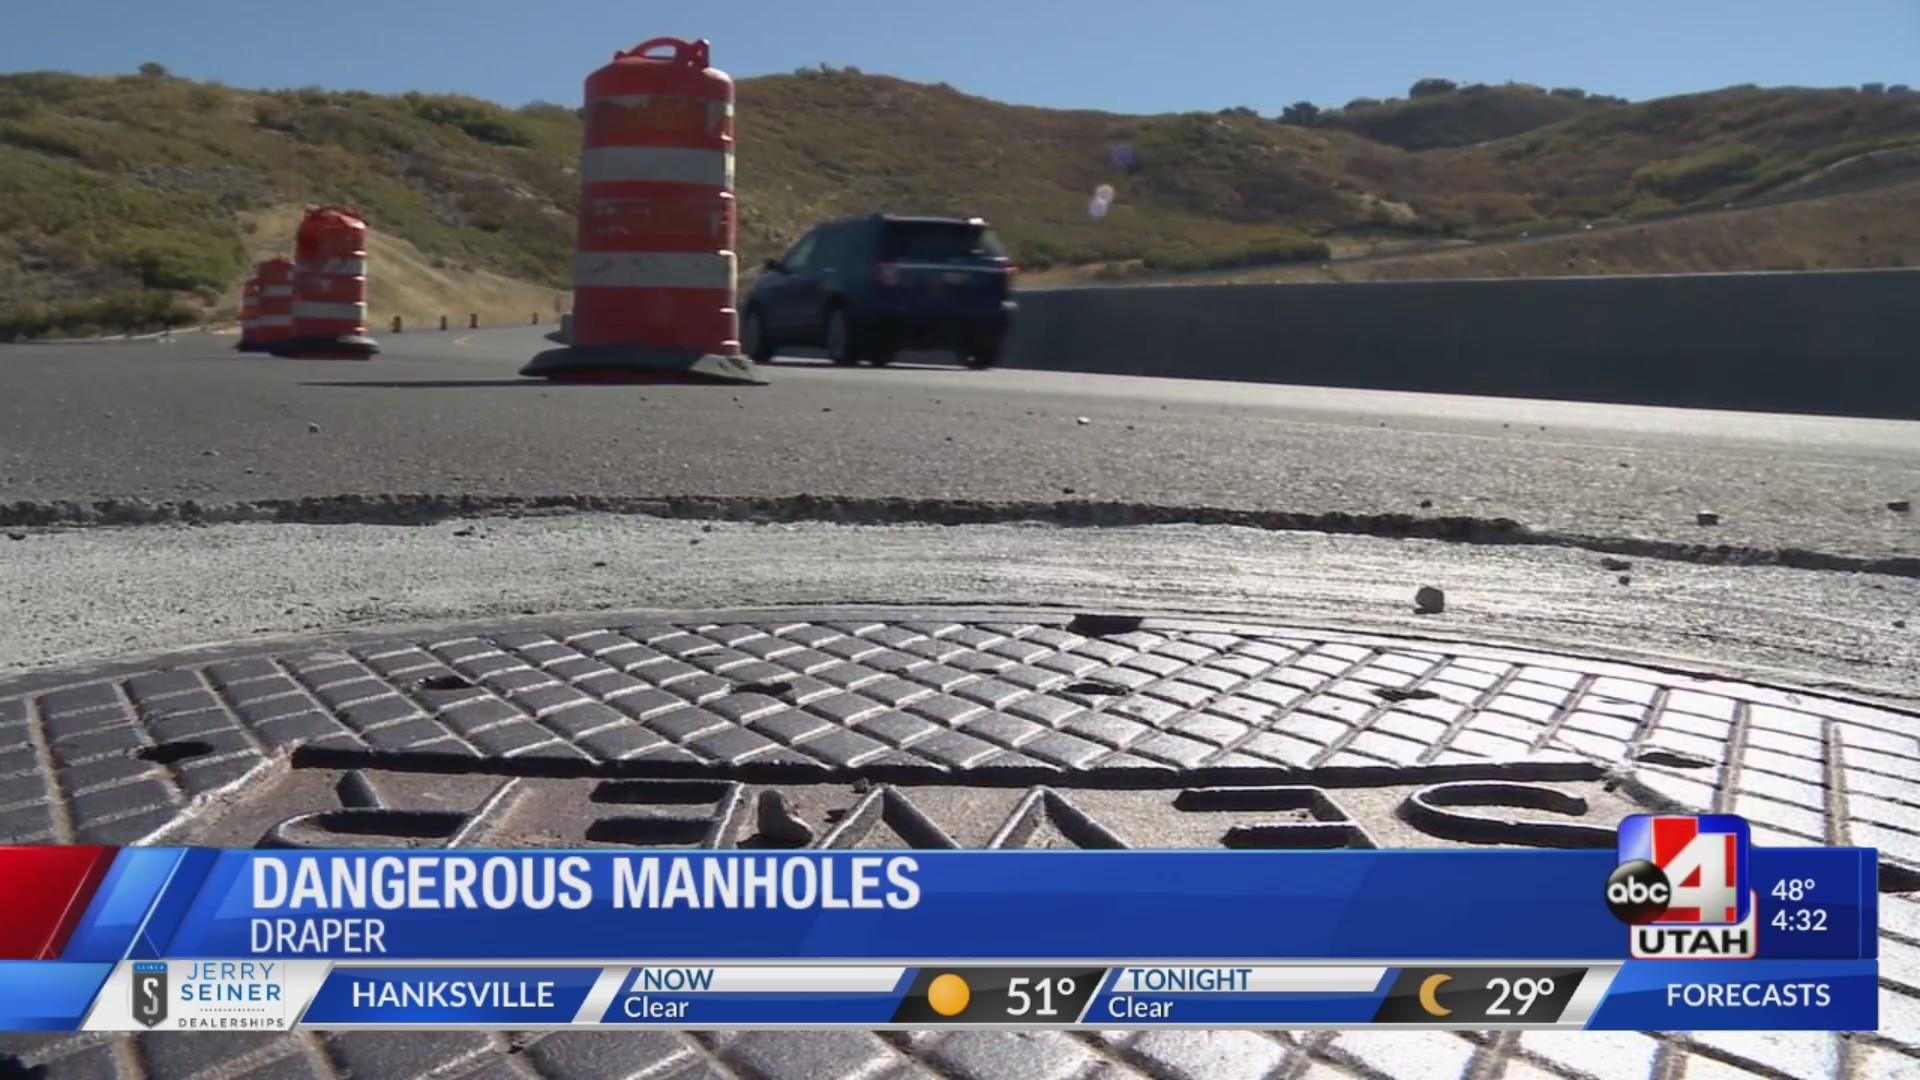 Draper Manholes